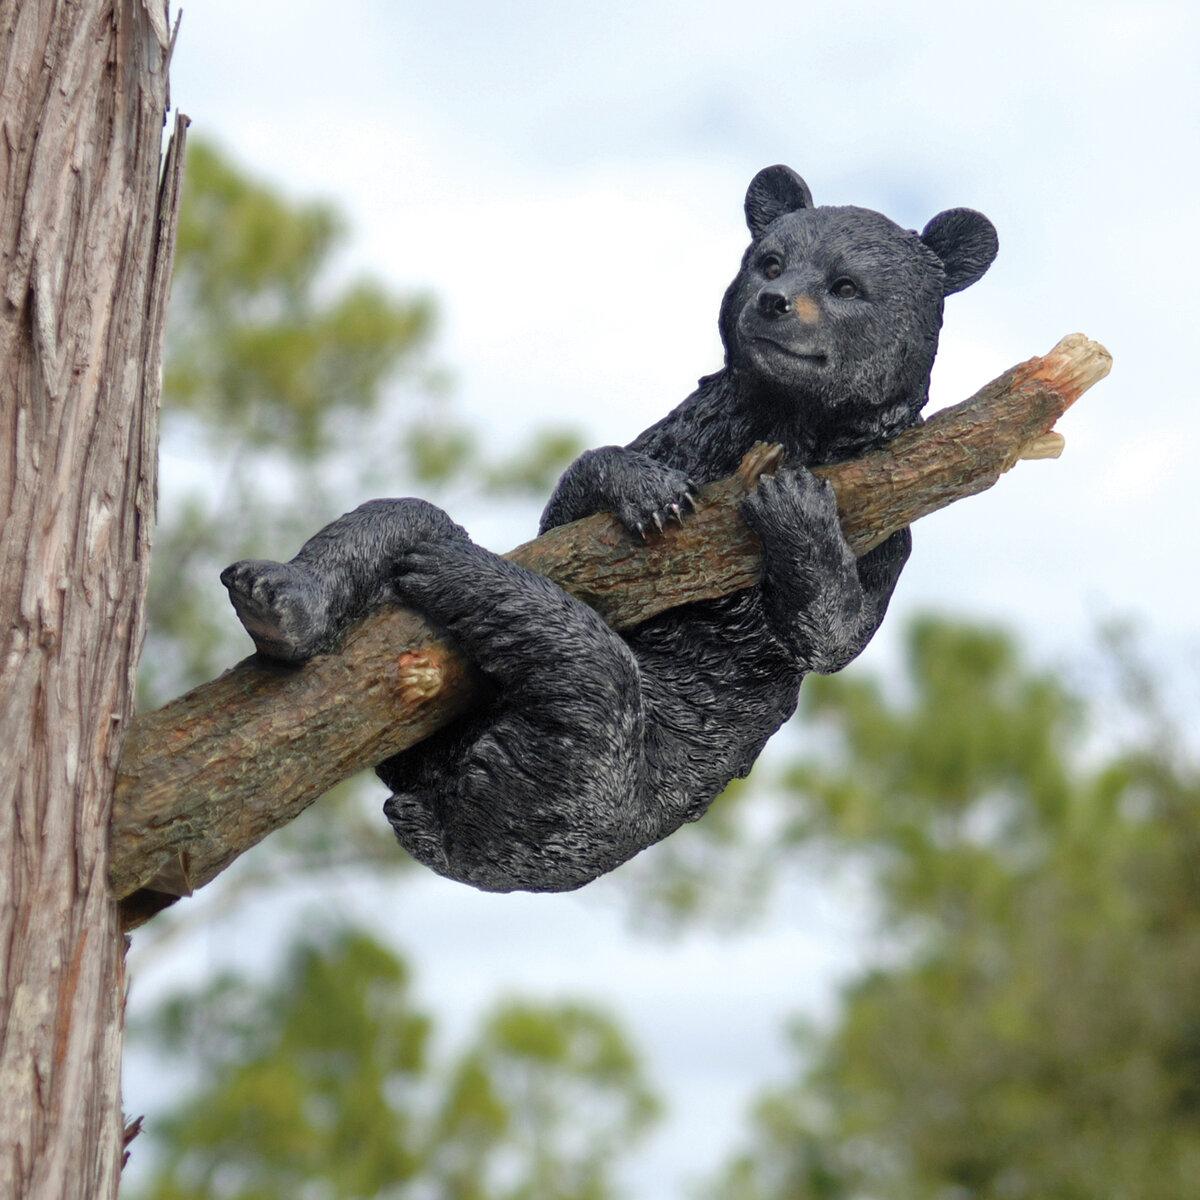 Black Bear Cub Wildlife Animal Statue Outdoor Tree Garden Sculpture Decor Art